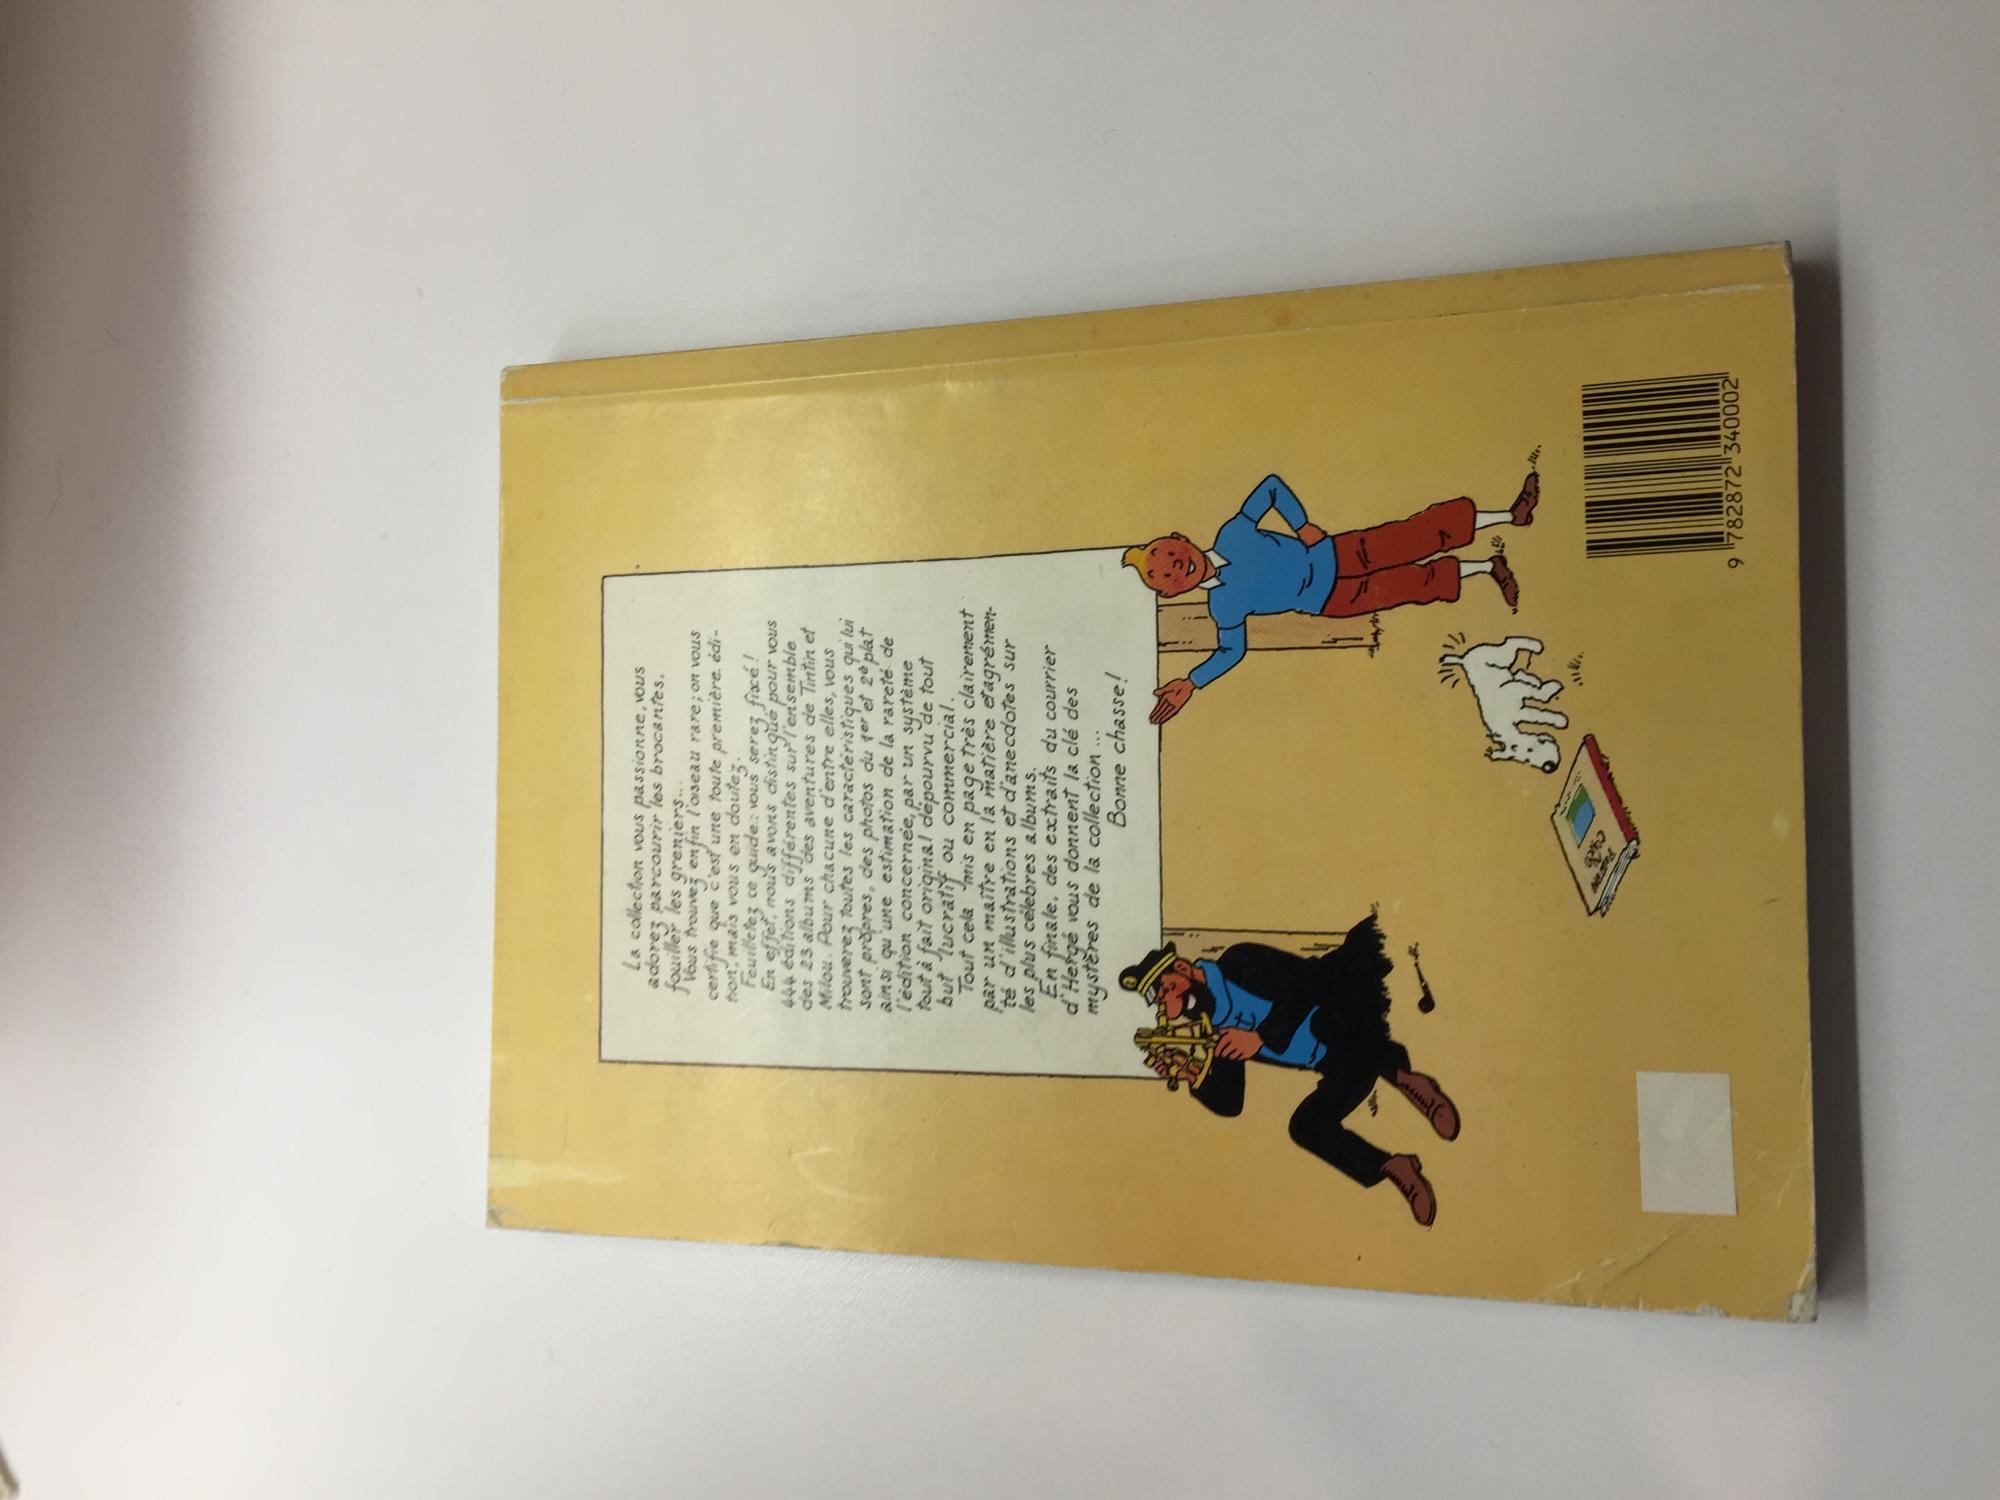 444 Albums Tintin - Guide Du Collectionneur (Brigode): Brigode (Herge and Tintin related)